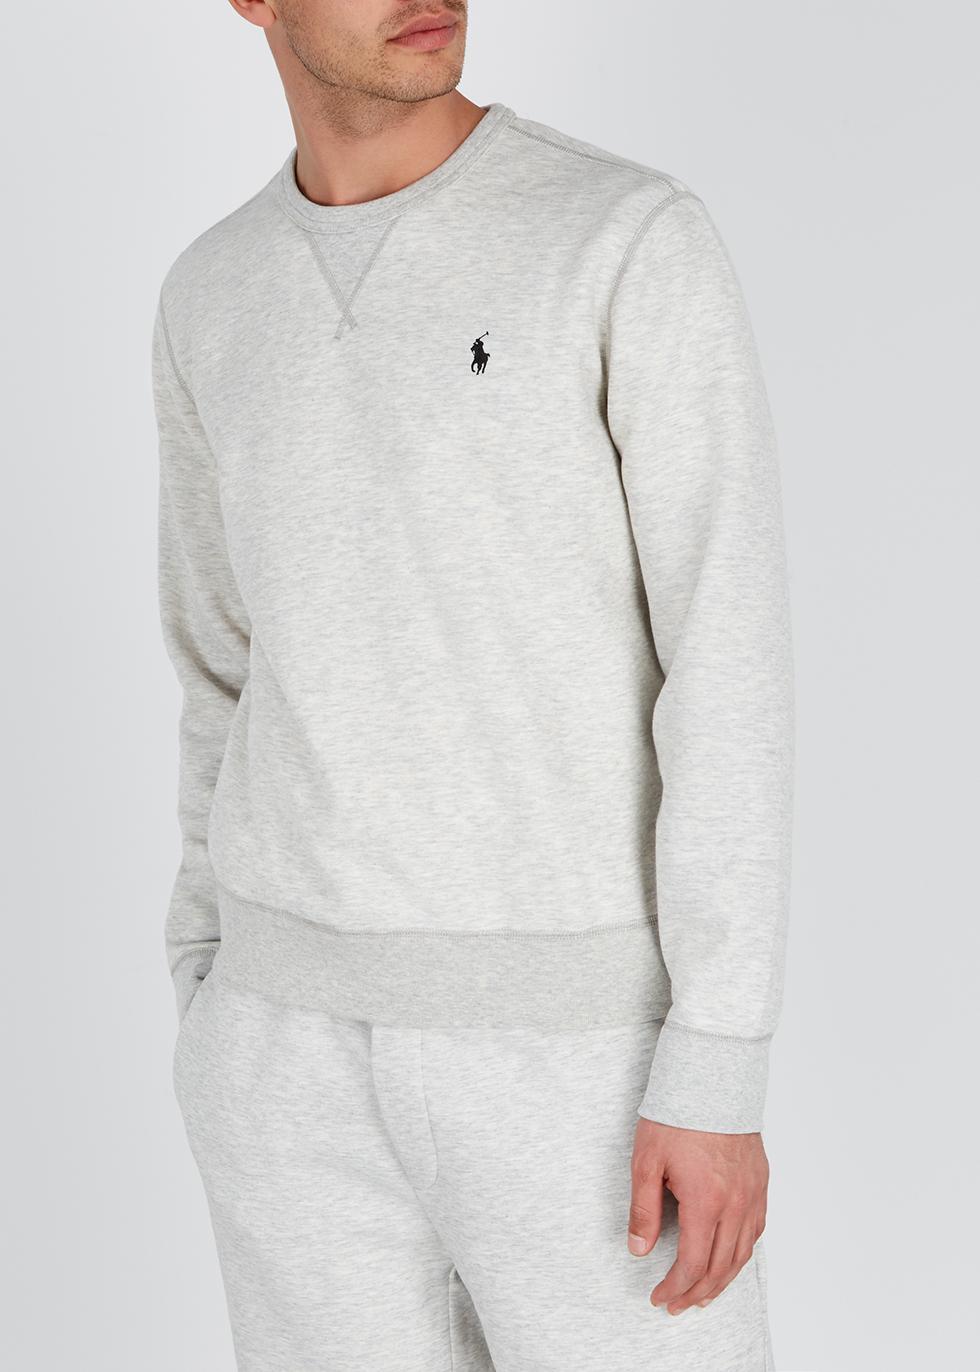 Performance grey mélange jersey sweatshirt - Polo Ralph Lauren